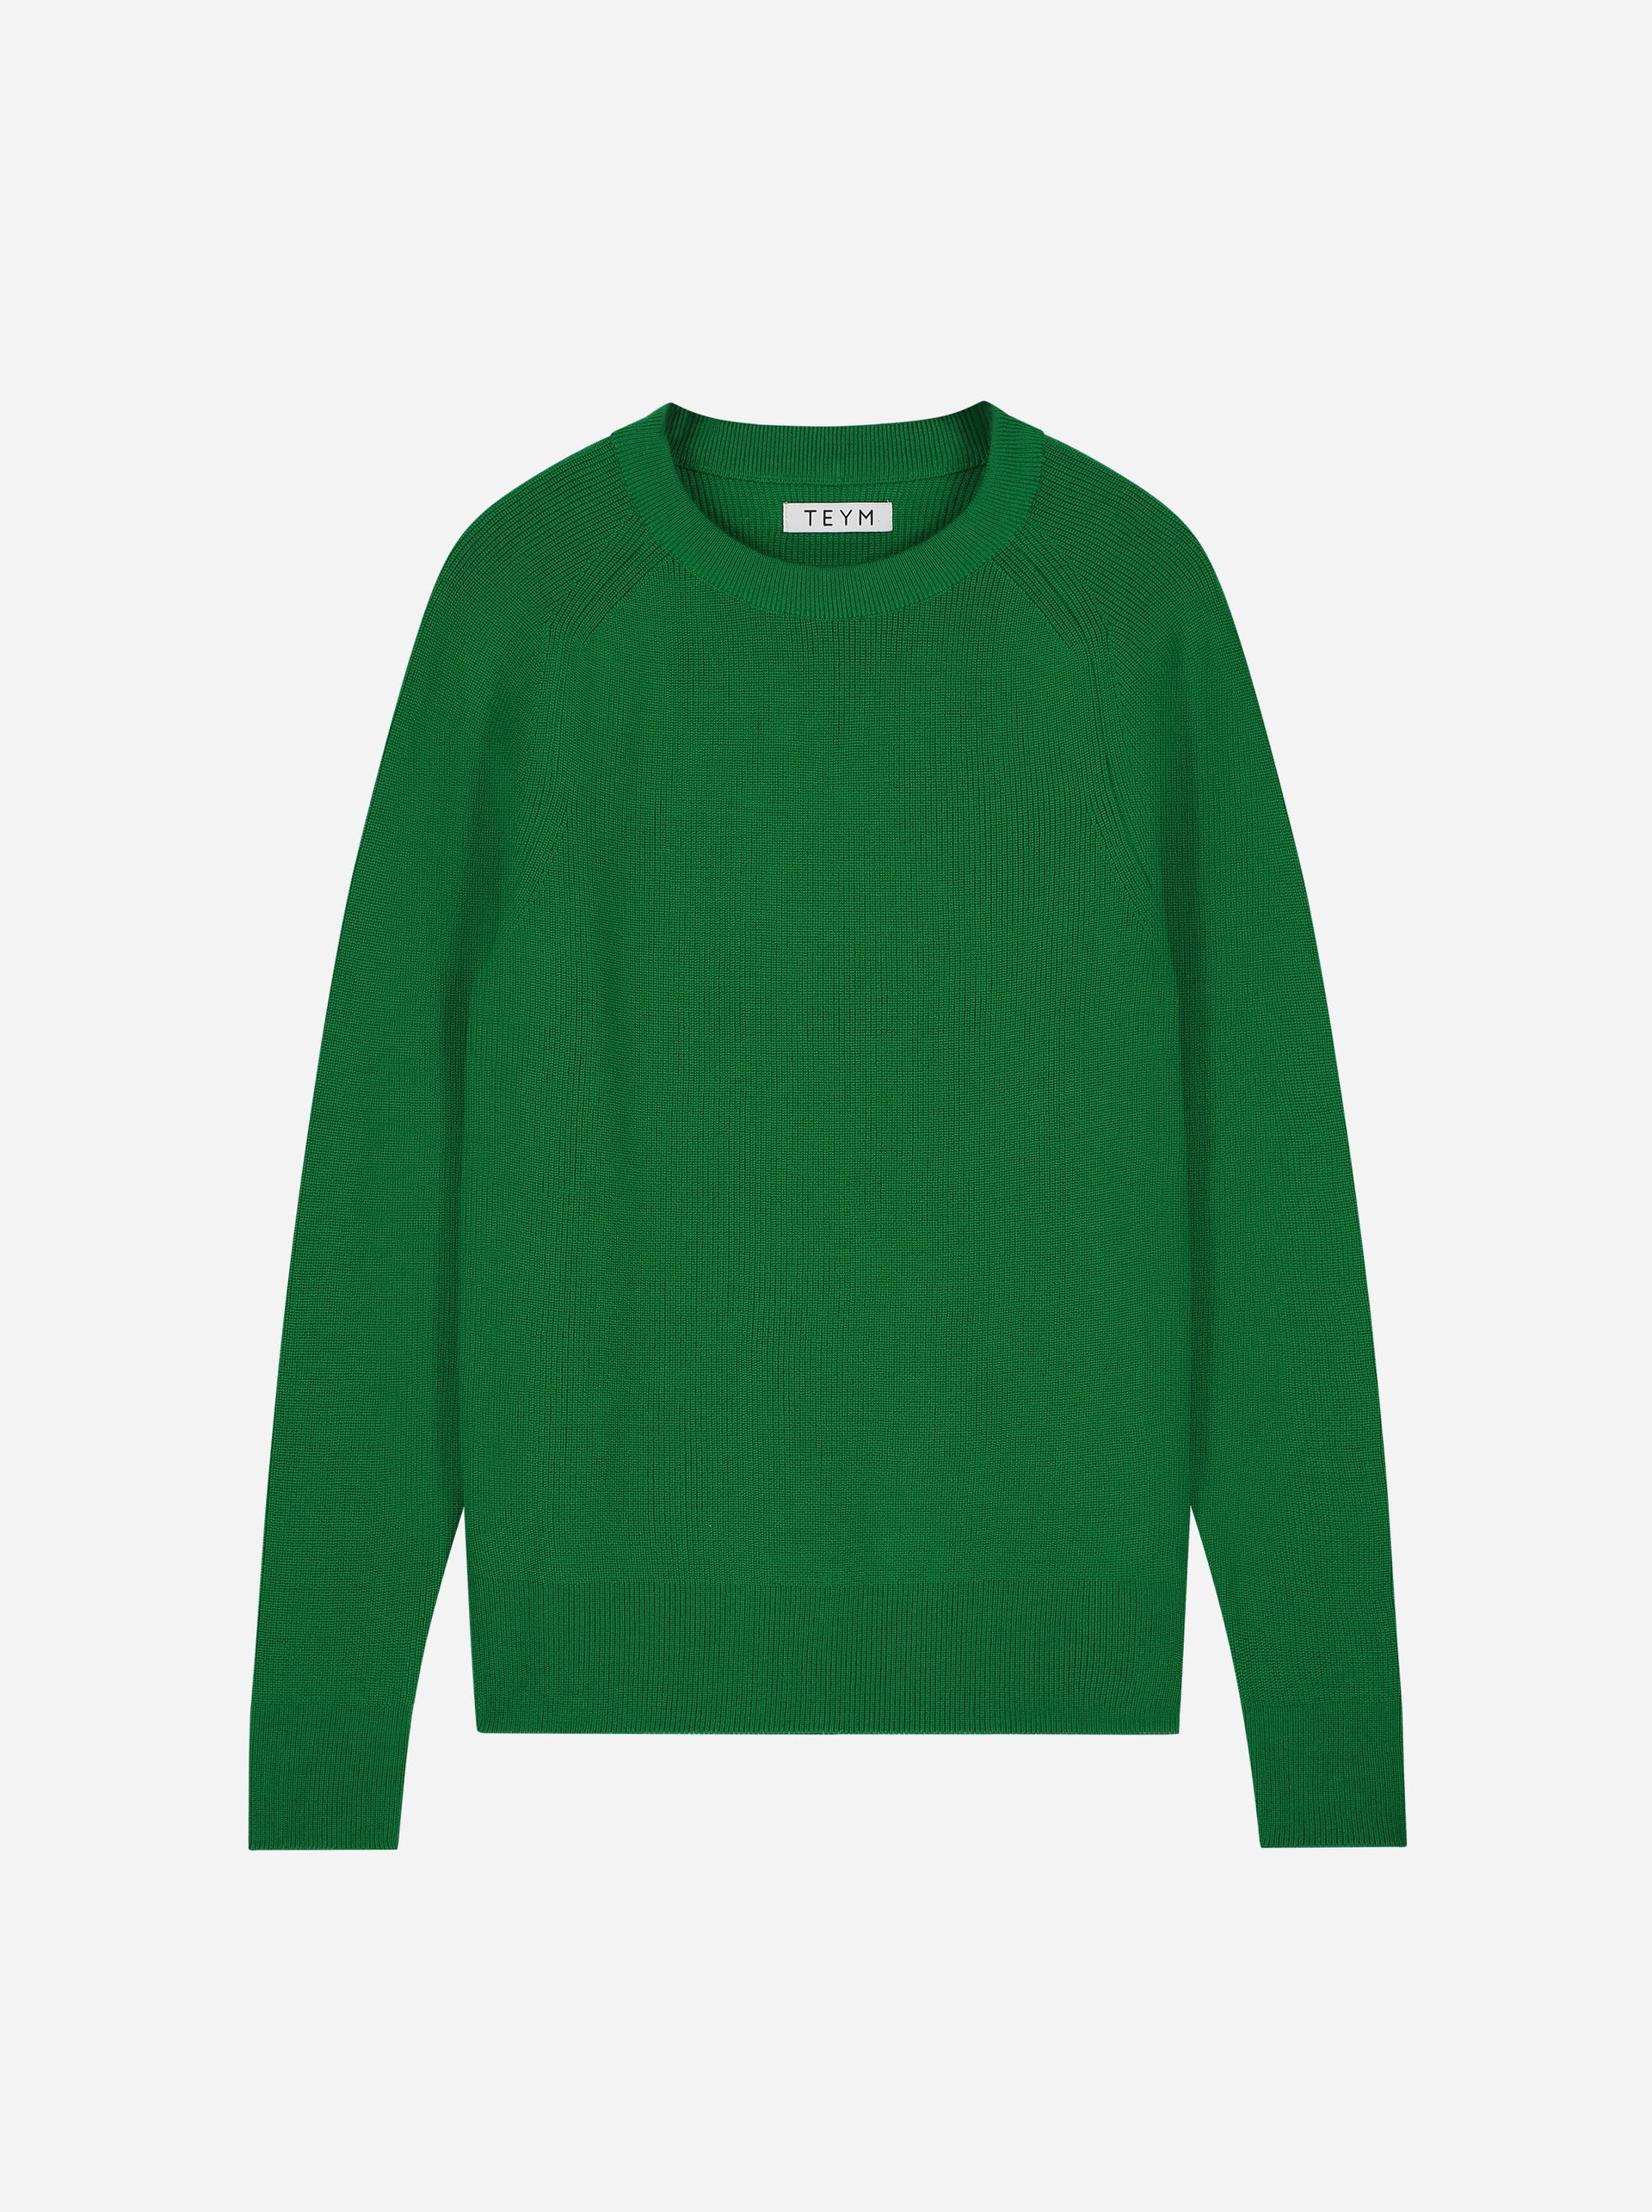 Teym - Crewneck - The Merino Sweater - Women - Brigh Green - 5